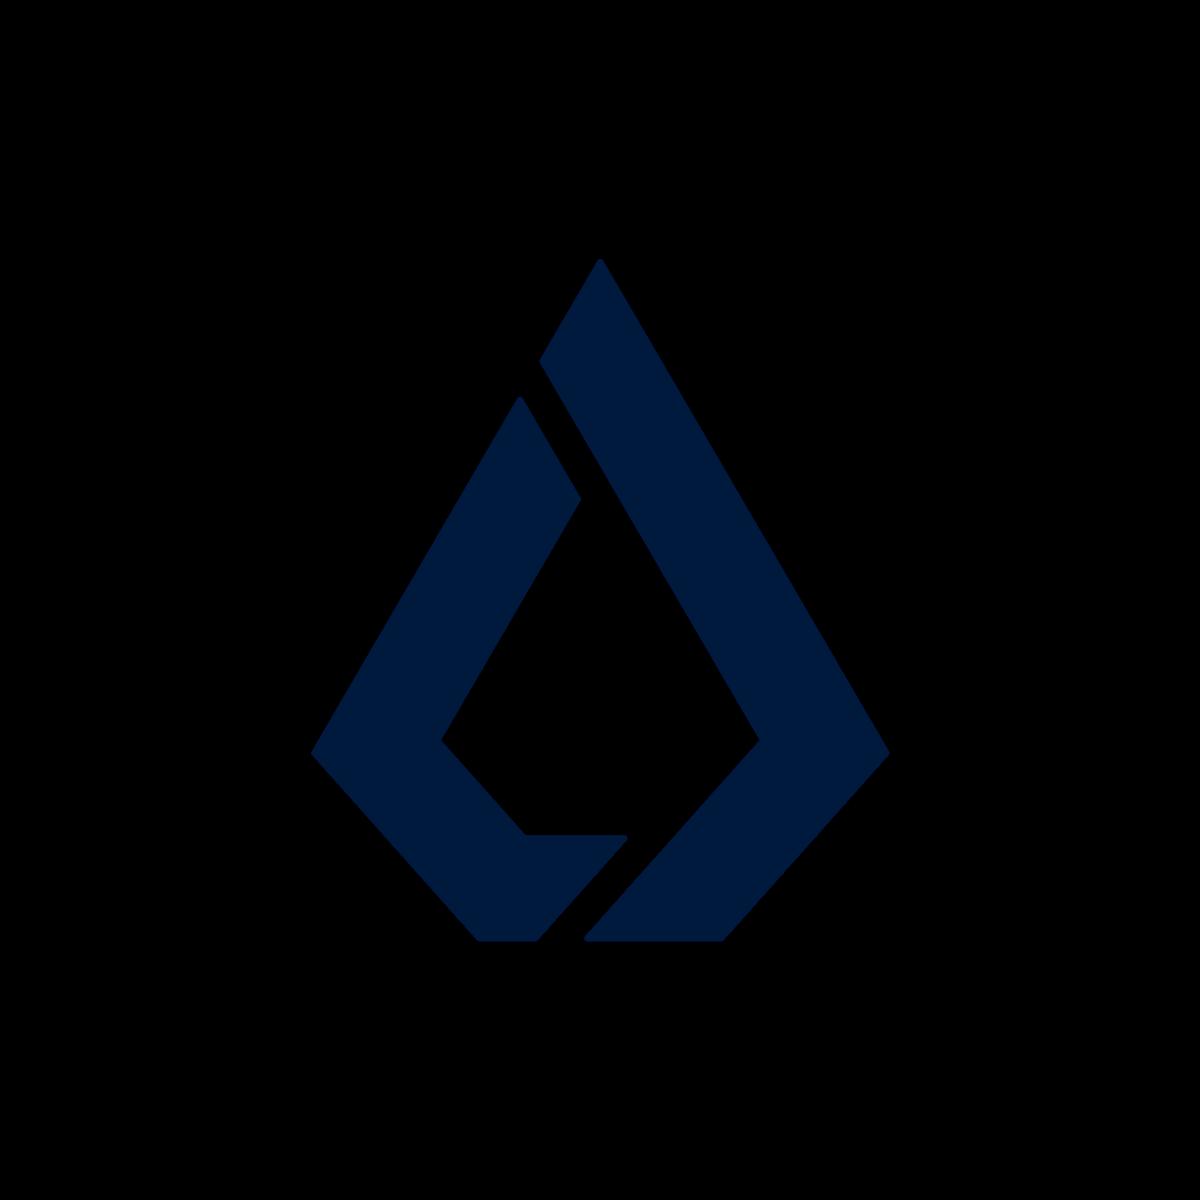 Rebranding Blockchain Cryptocurrency Lisk Others Logo Blockchain Cryptocurrency Logos Cryptocurrency